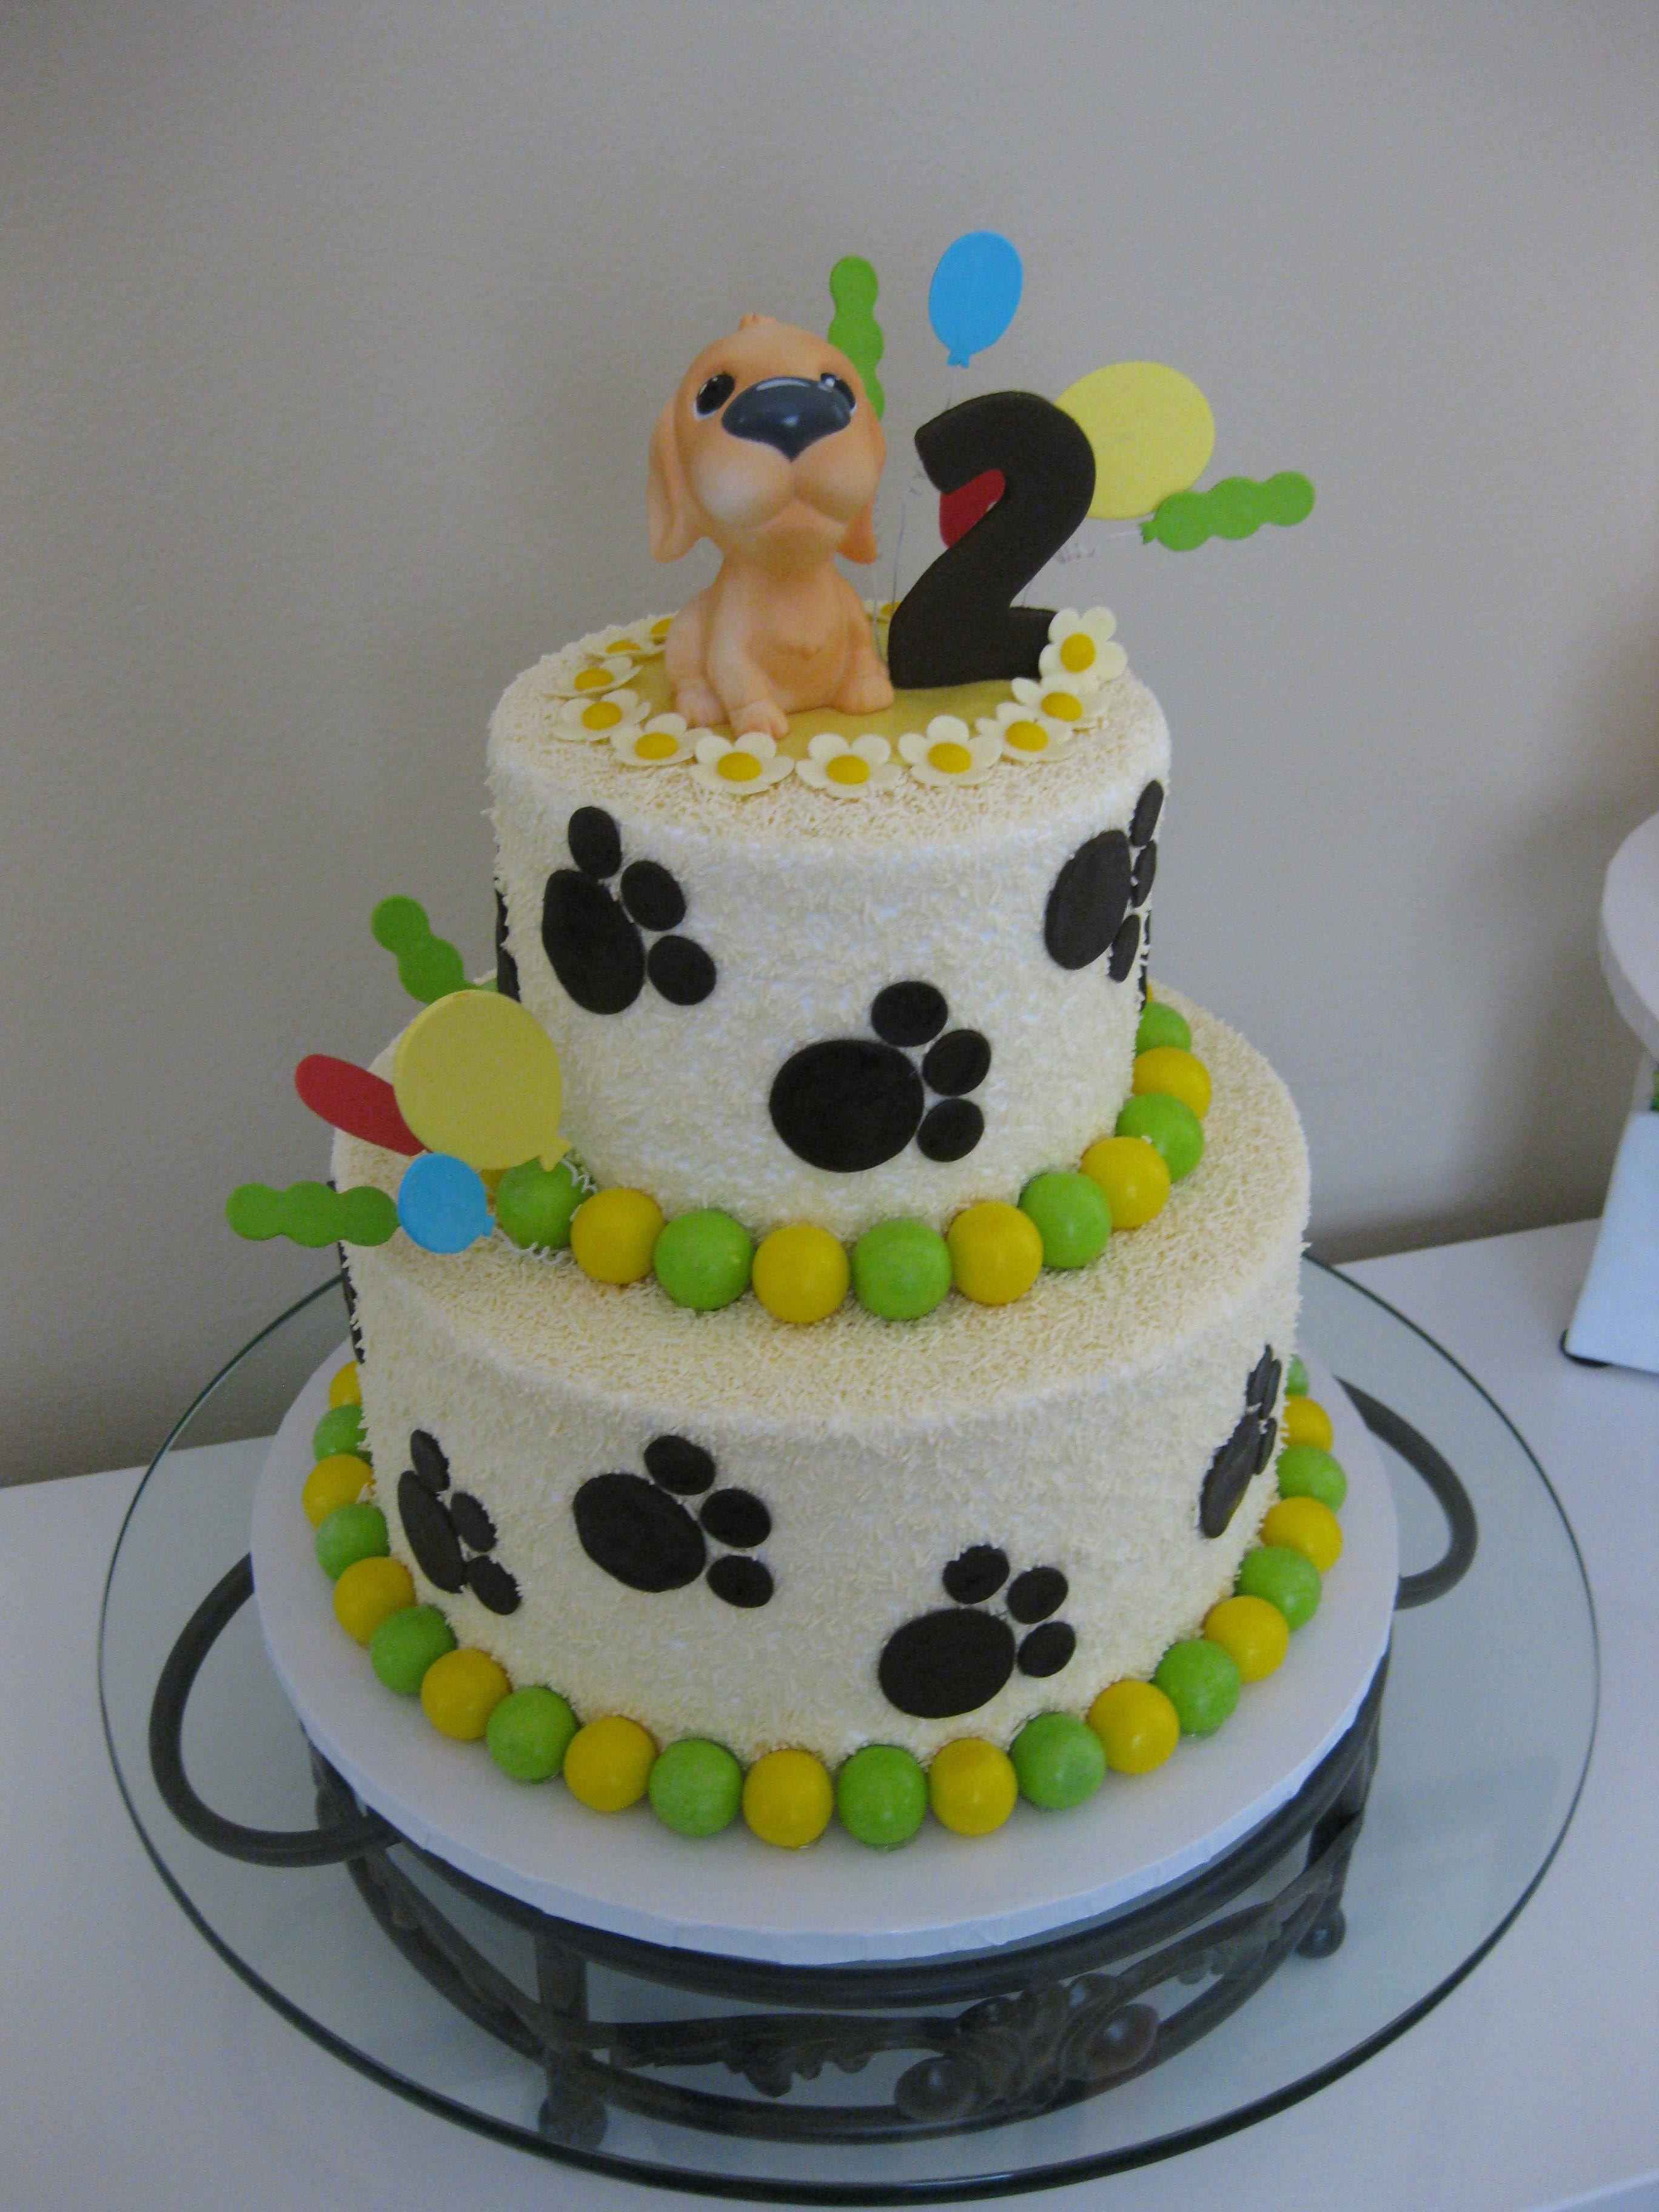 Birthday cake for a little boy...